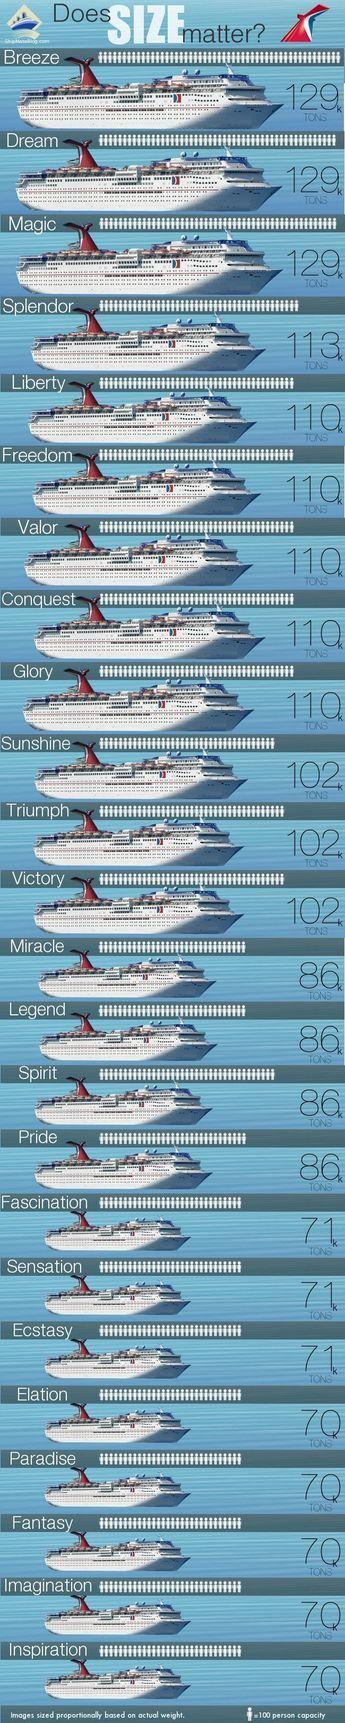 Carnival-Cruise-Ships-Size-Comparison